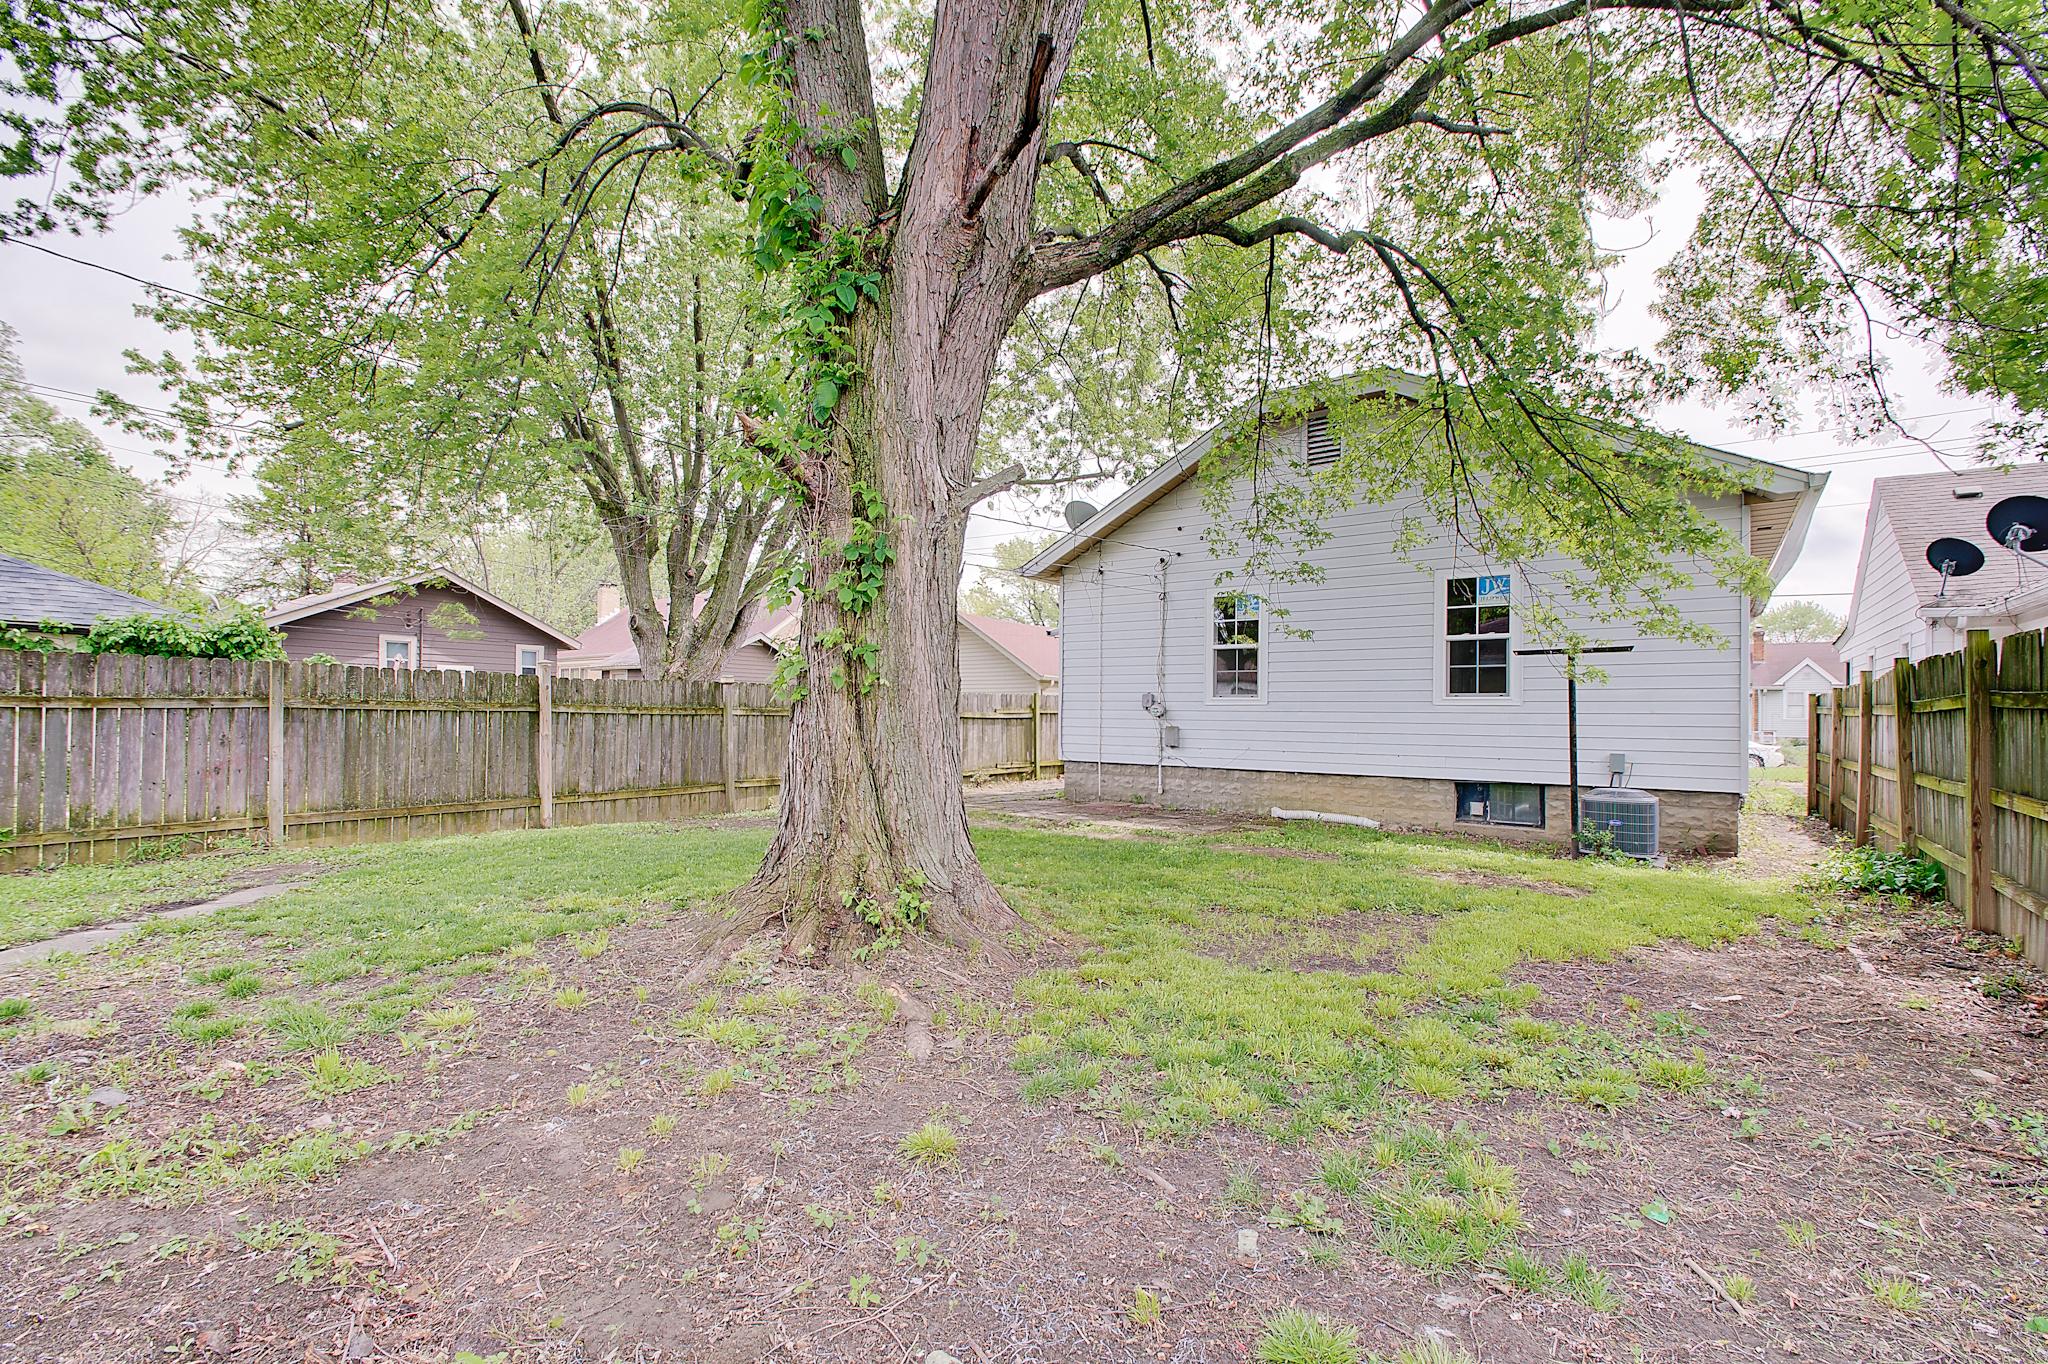 25-Rear-Yard-View-3.jpg